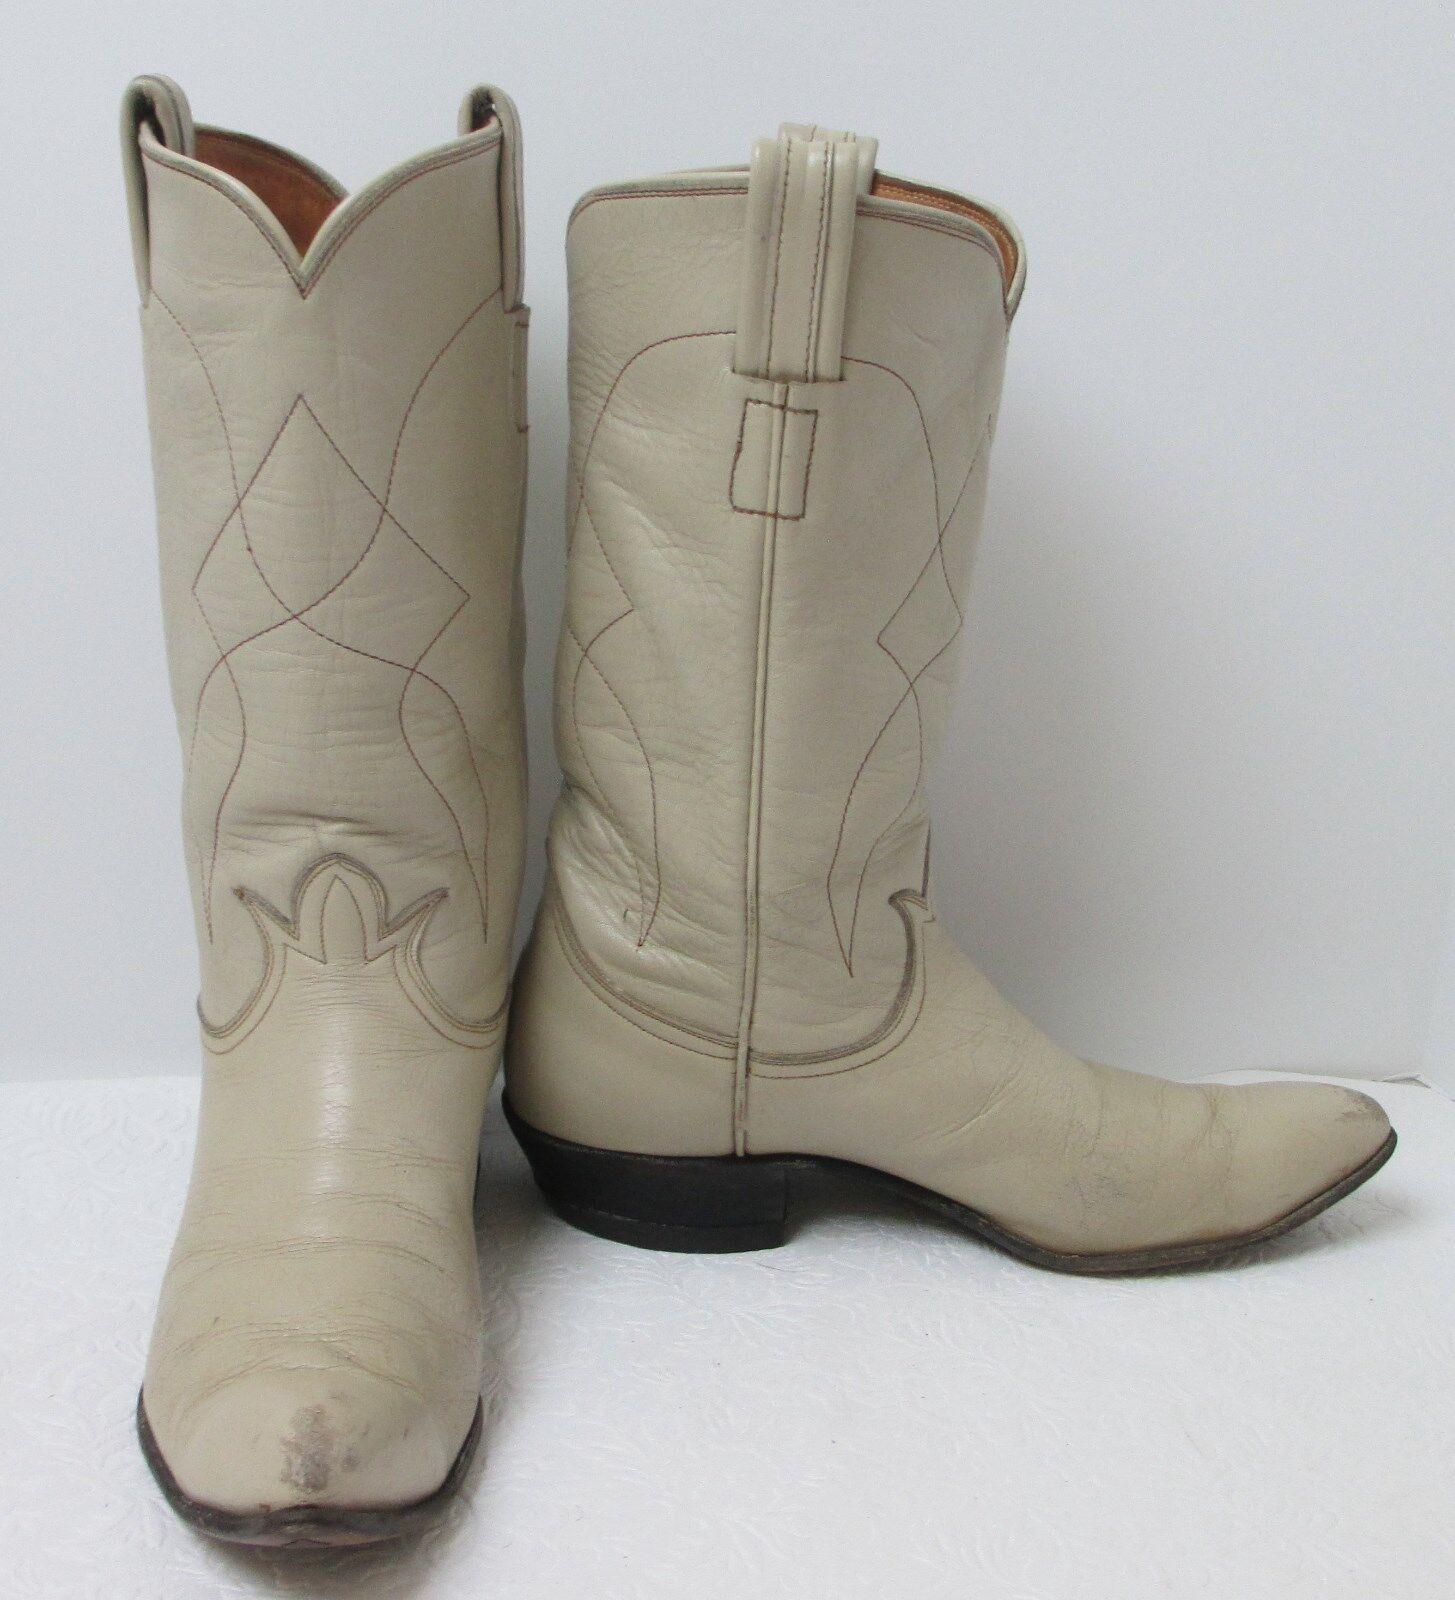 Women's Vintage 50's Tony Lama 4149 Bone Leather Cowboy Boots Sz 5.5